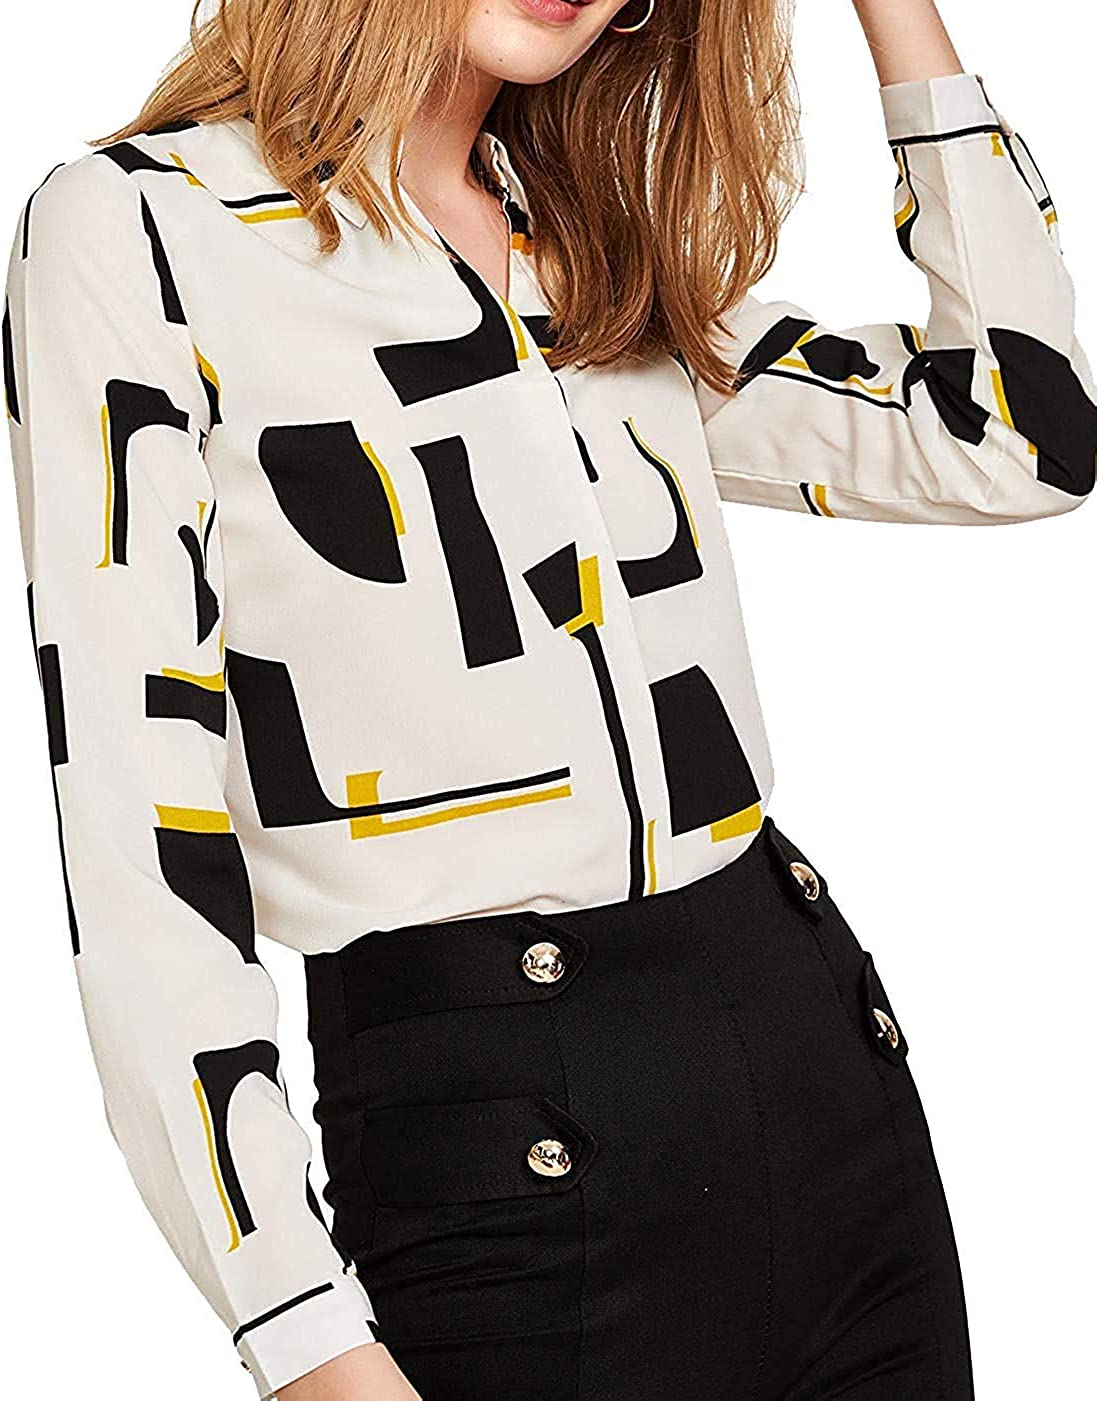 Milumia Women's Geometric Print Shirt Long Sleeve Chiffon Work Blouse Top